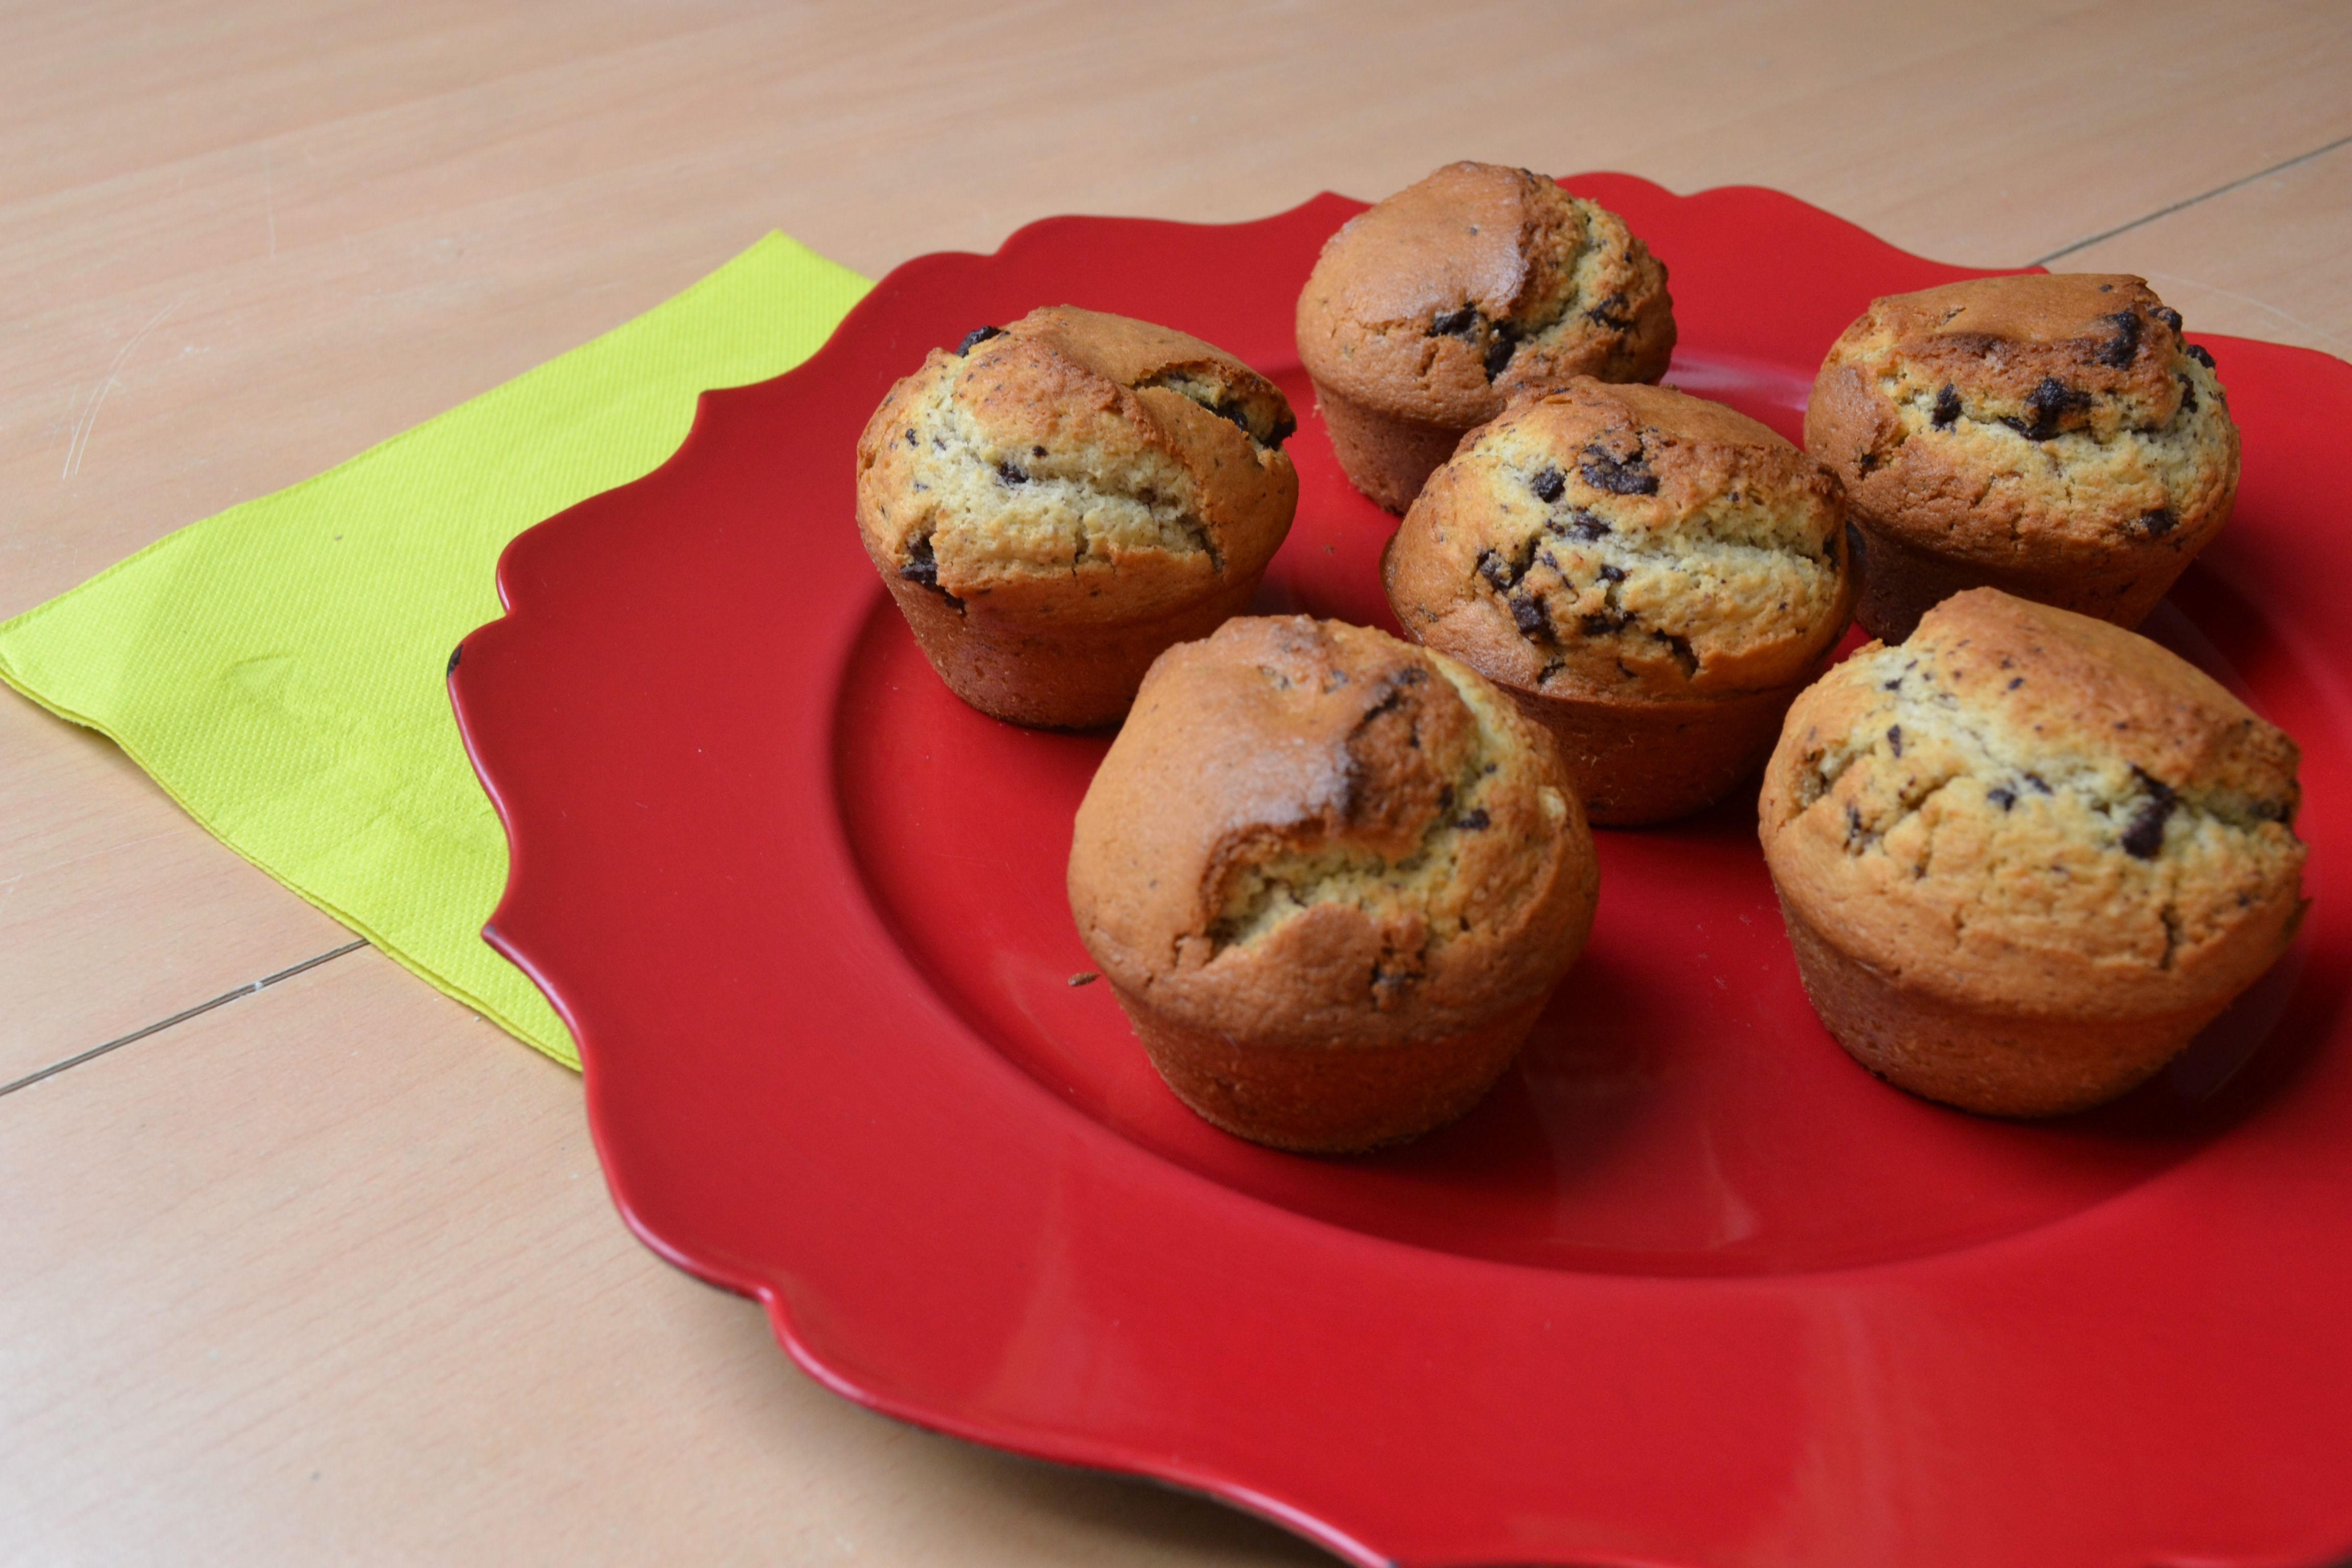 Le jeudi, c'est veggie #9 Muffins au chocolat (vegan) by Miam&Trucs